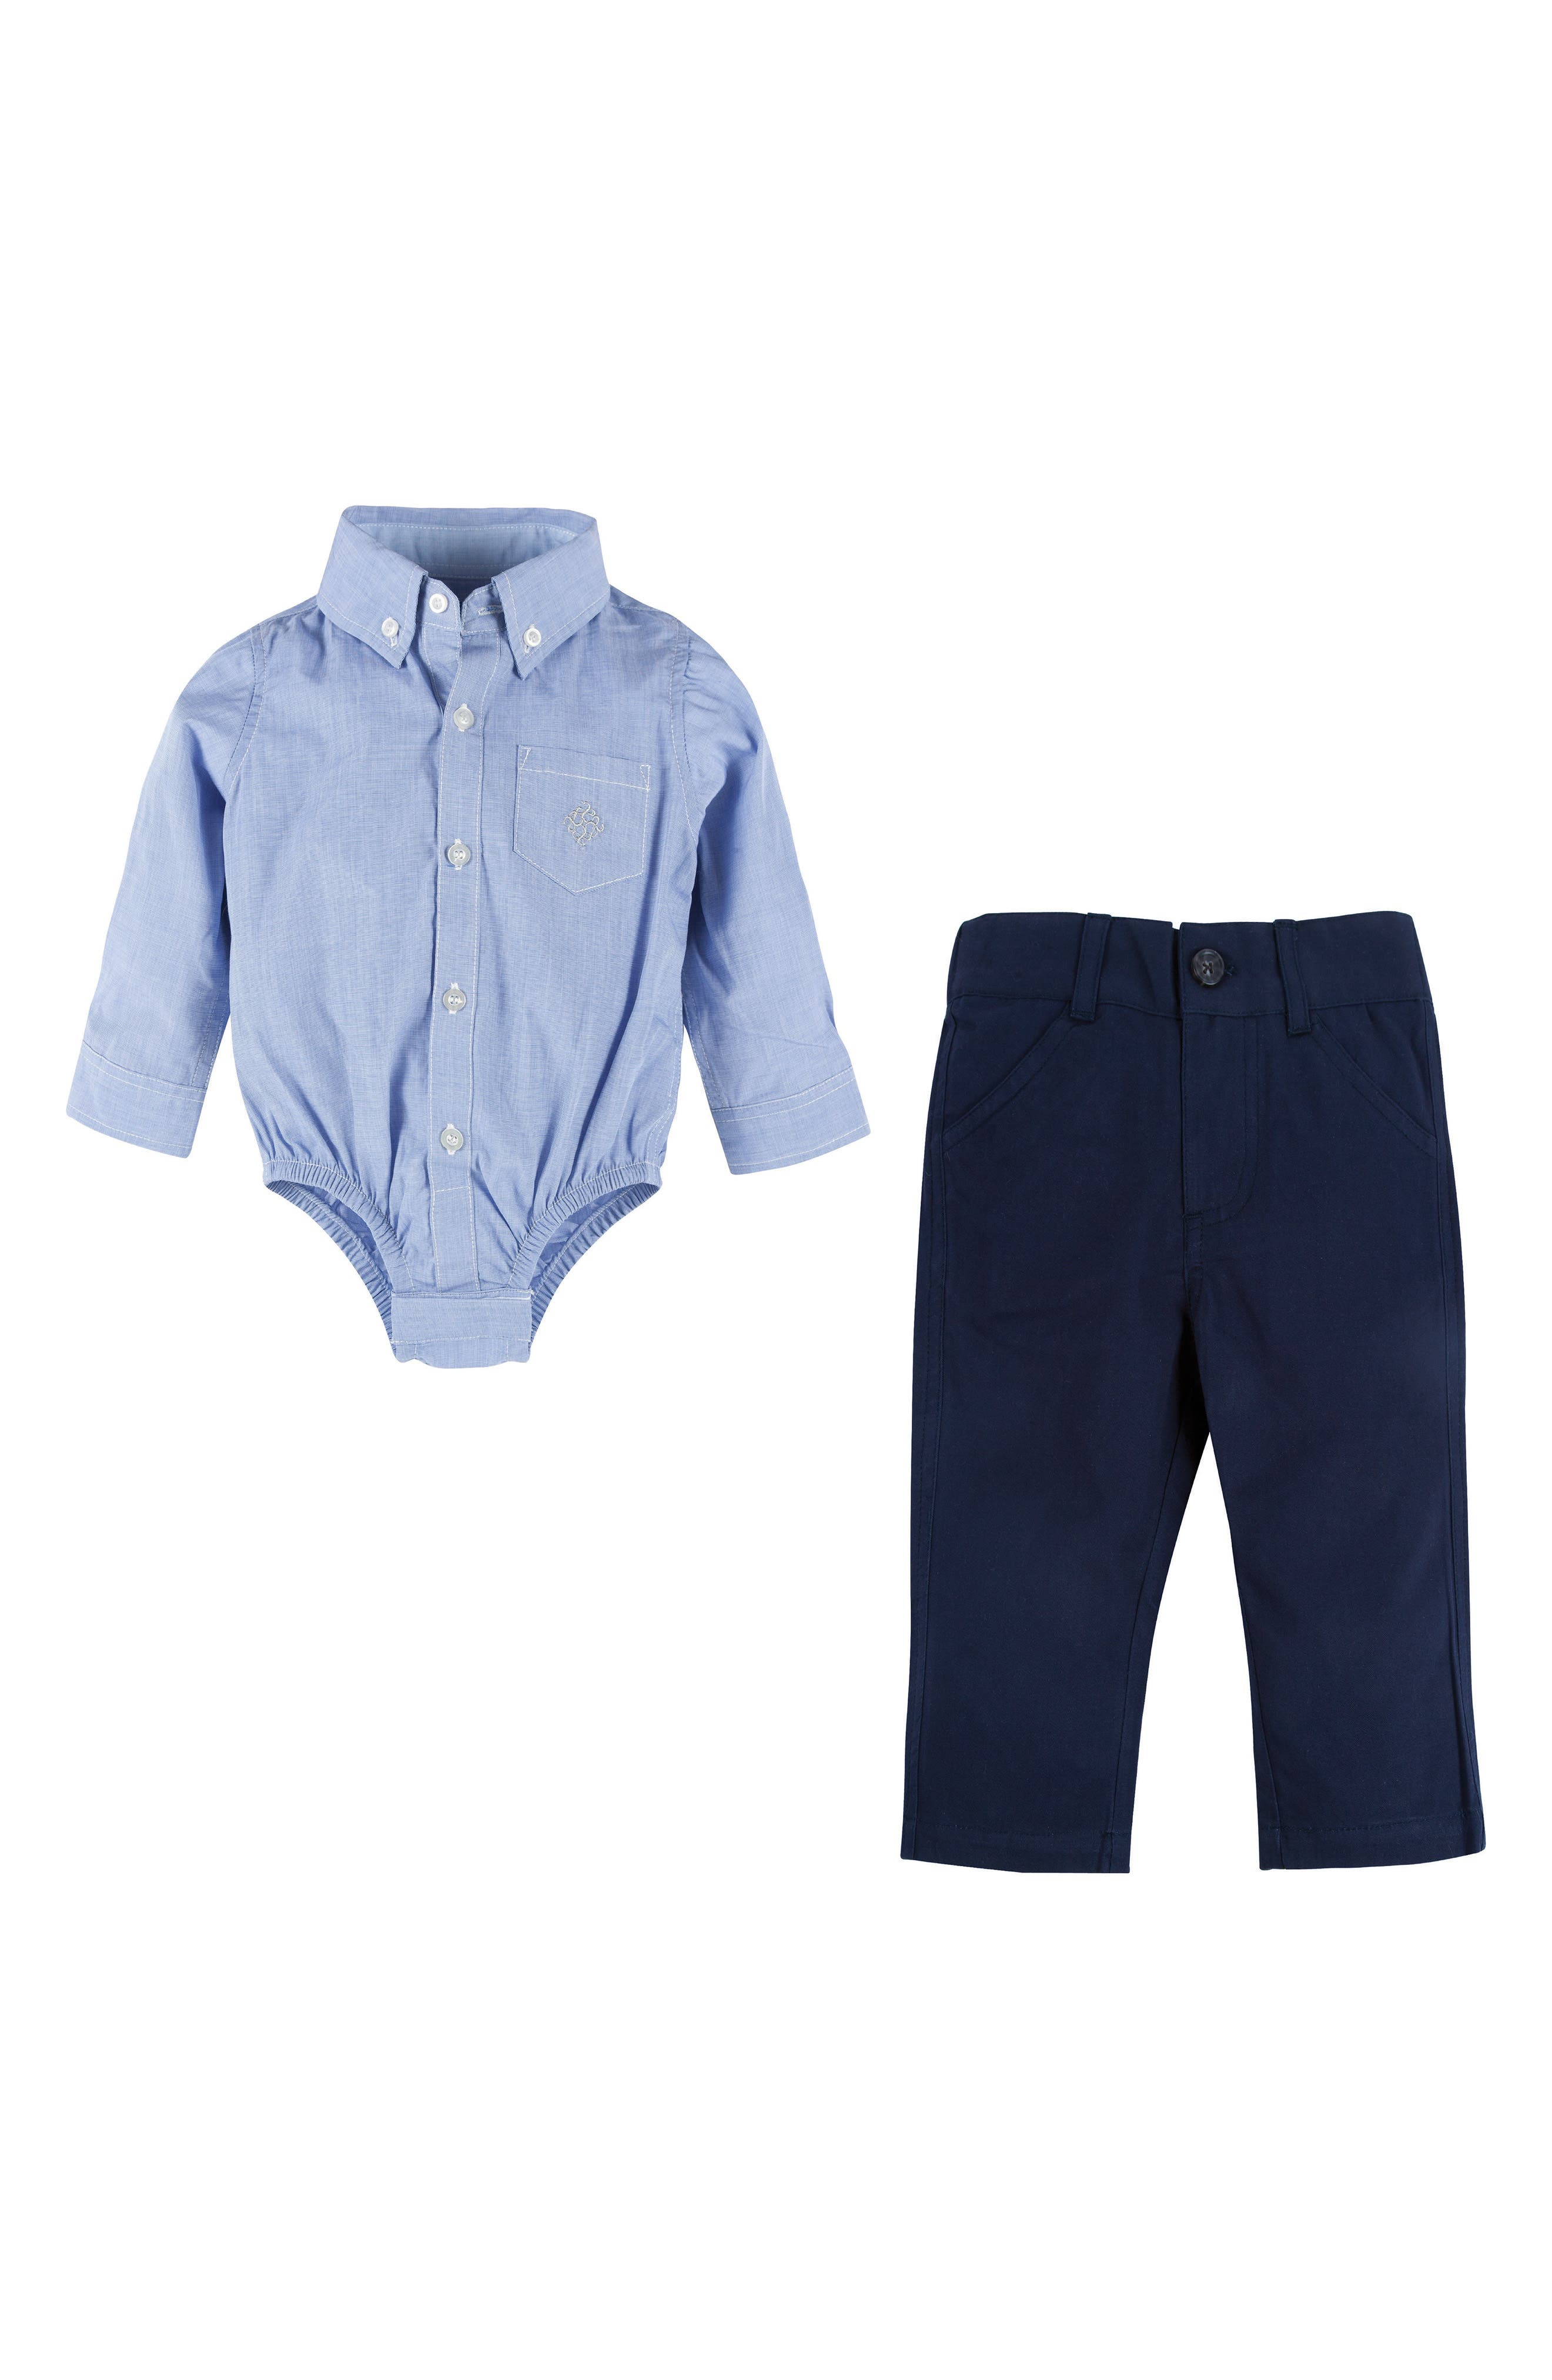 Shirtzie Chambray Bodysuit & Pants Set,                             Main thumbnail 1, color,                             Blue